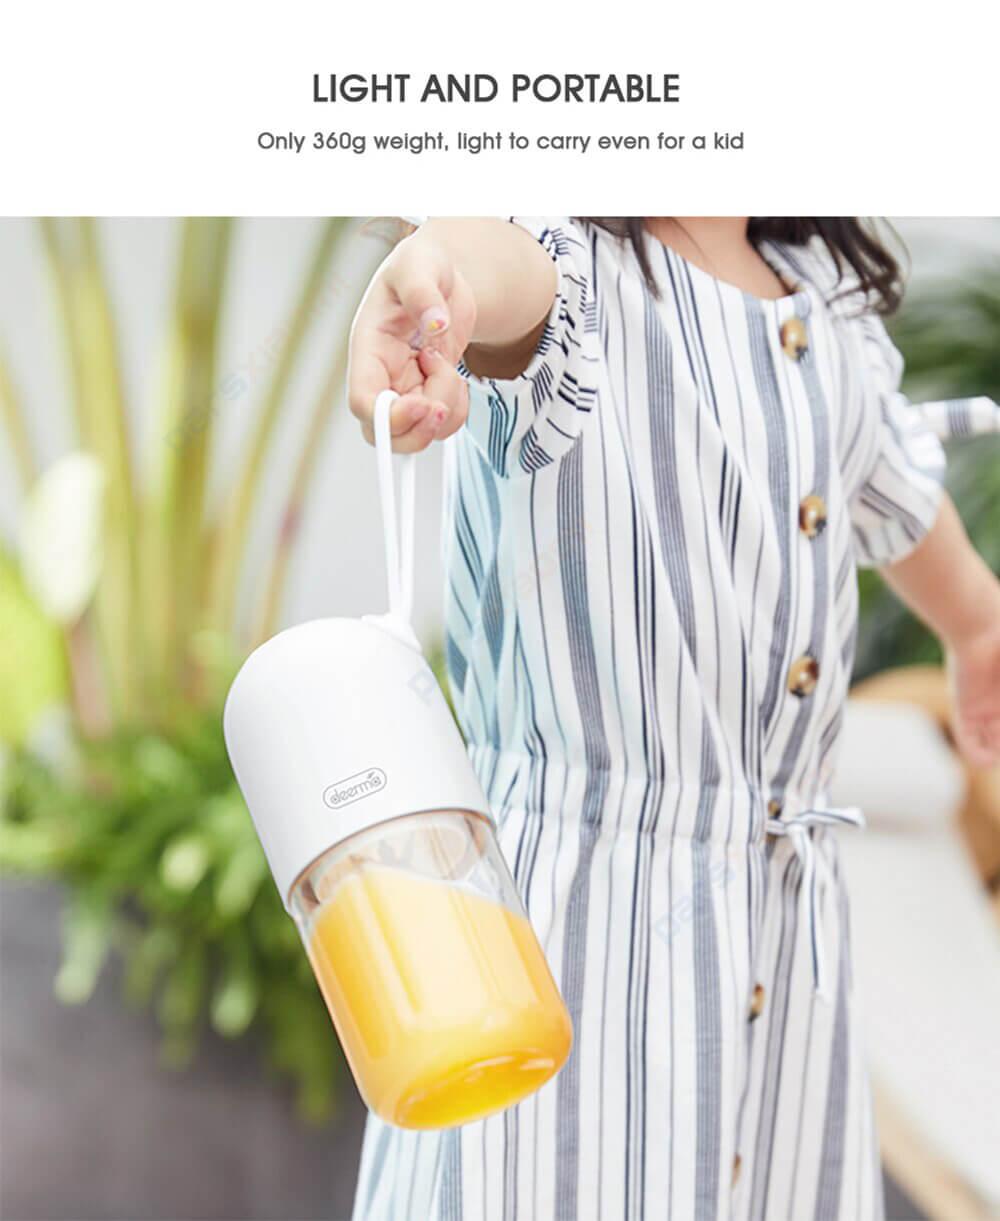 مخلوط کن قابل حمل شارژی شیائومی Xiaomi Deerma DEM-NU11 Portable Juicer Blender